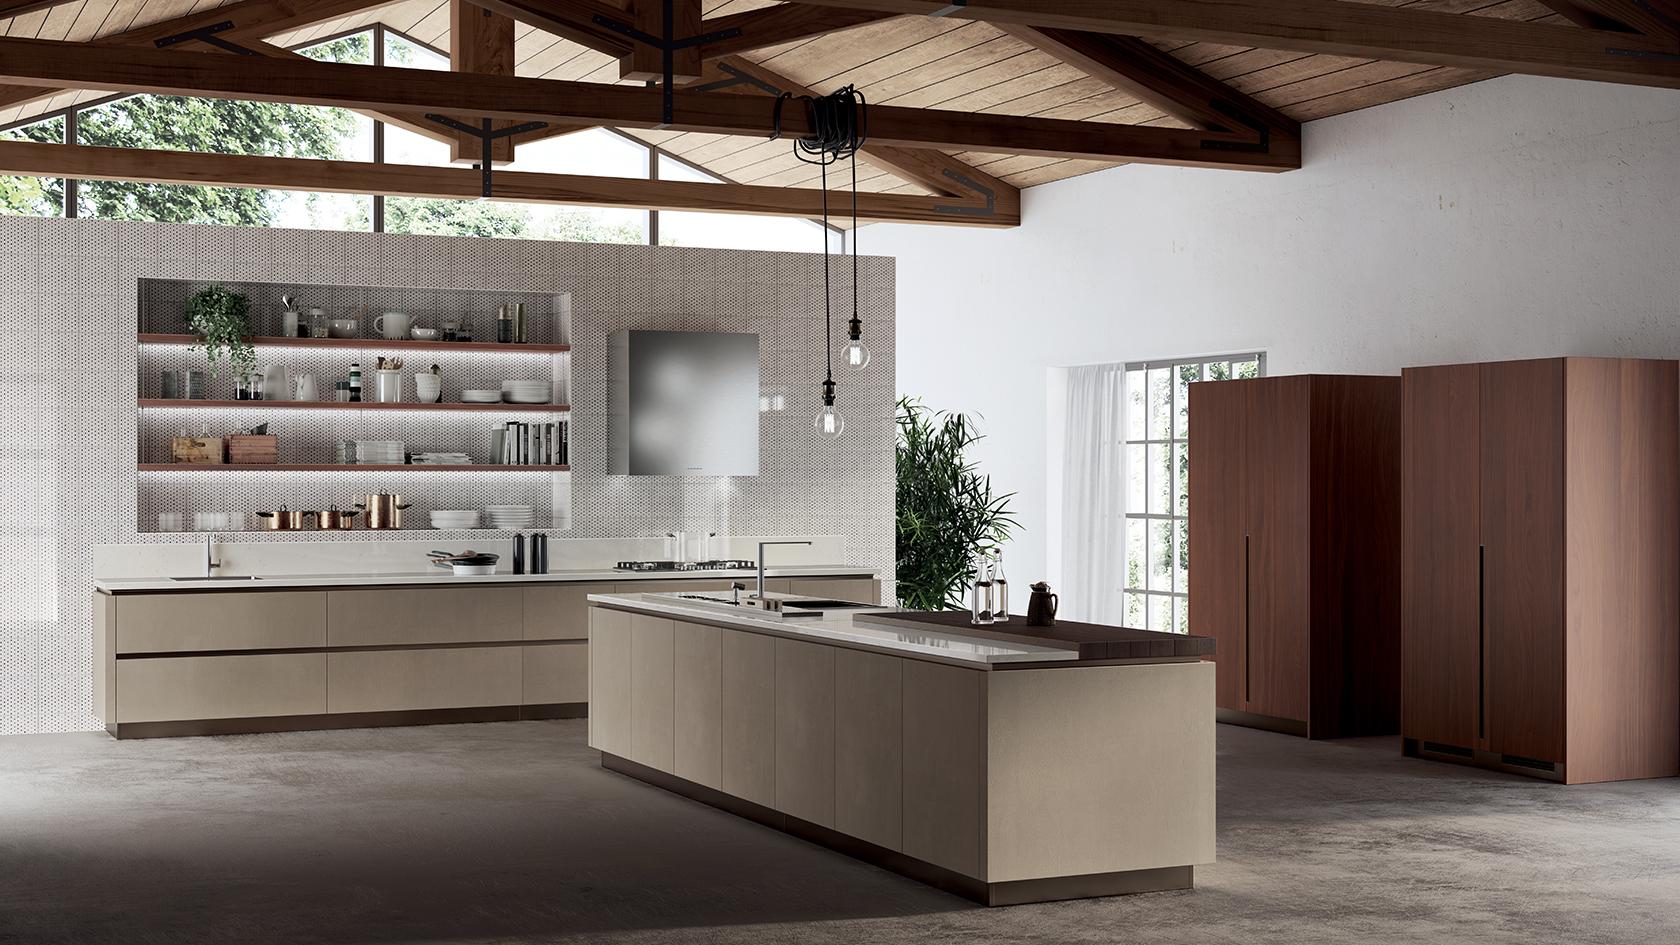 Cucina Moderna Scavolini LiberaMente-Mobili incardone